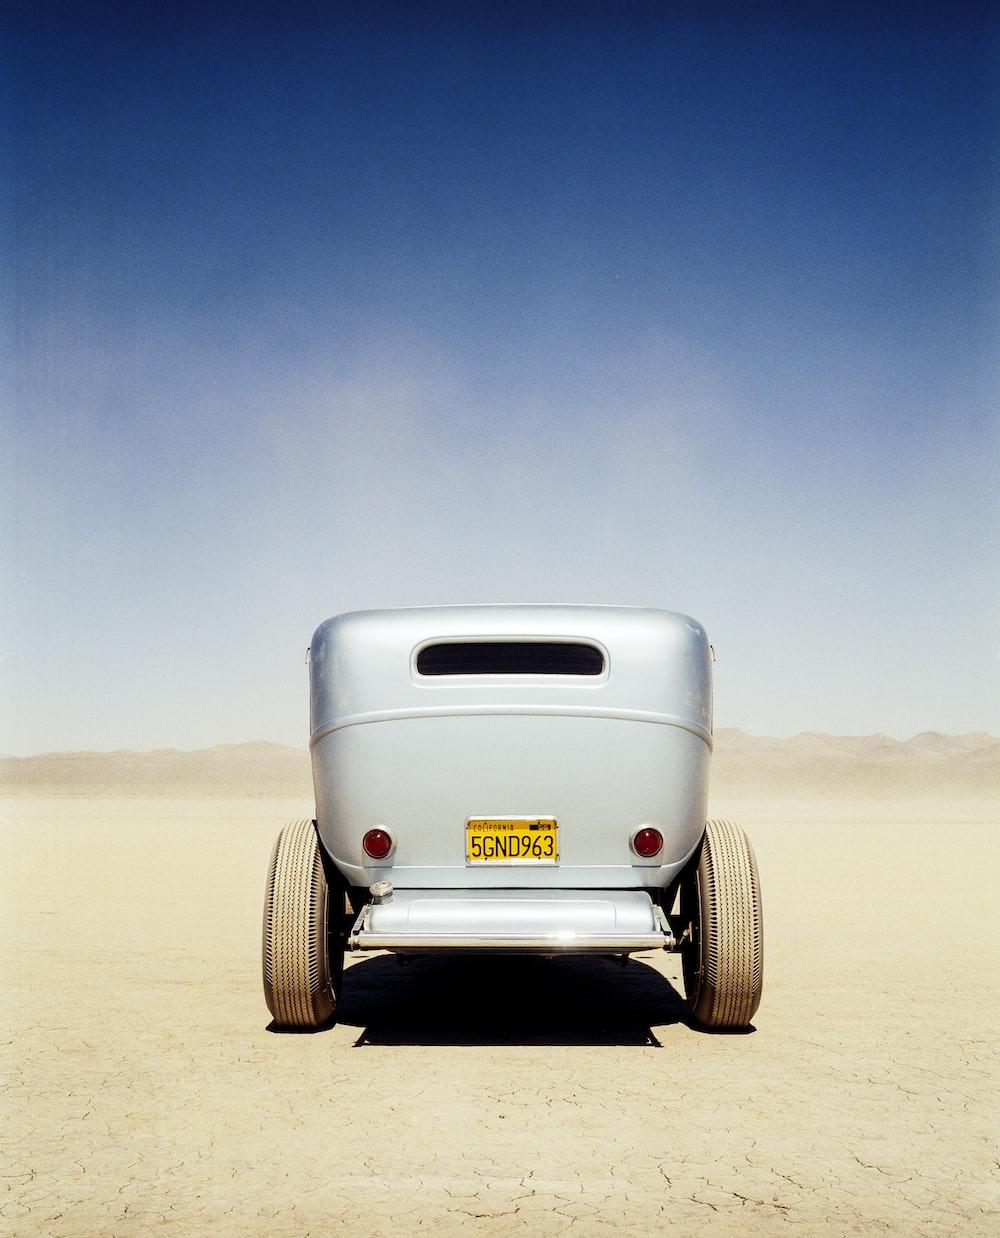 white car on brown sand under blue sky during daytime